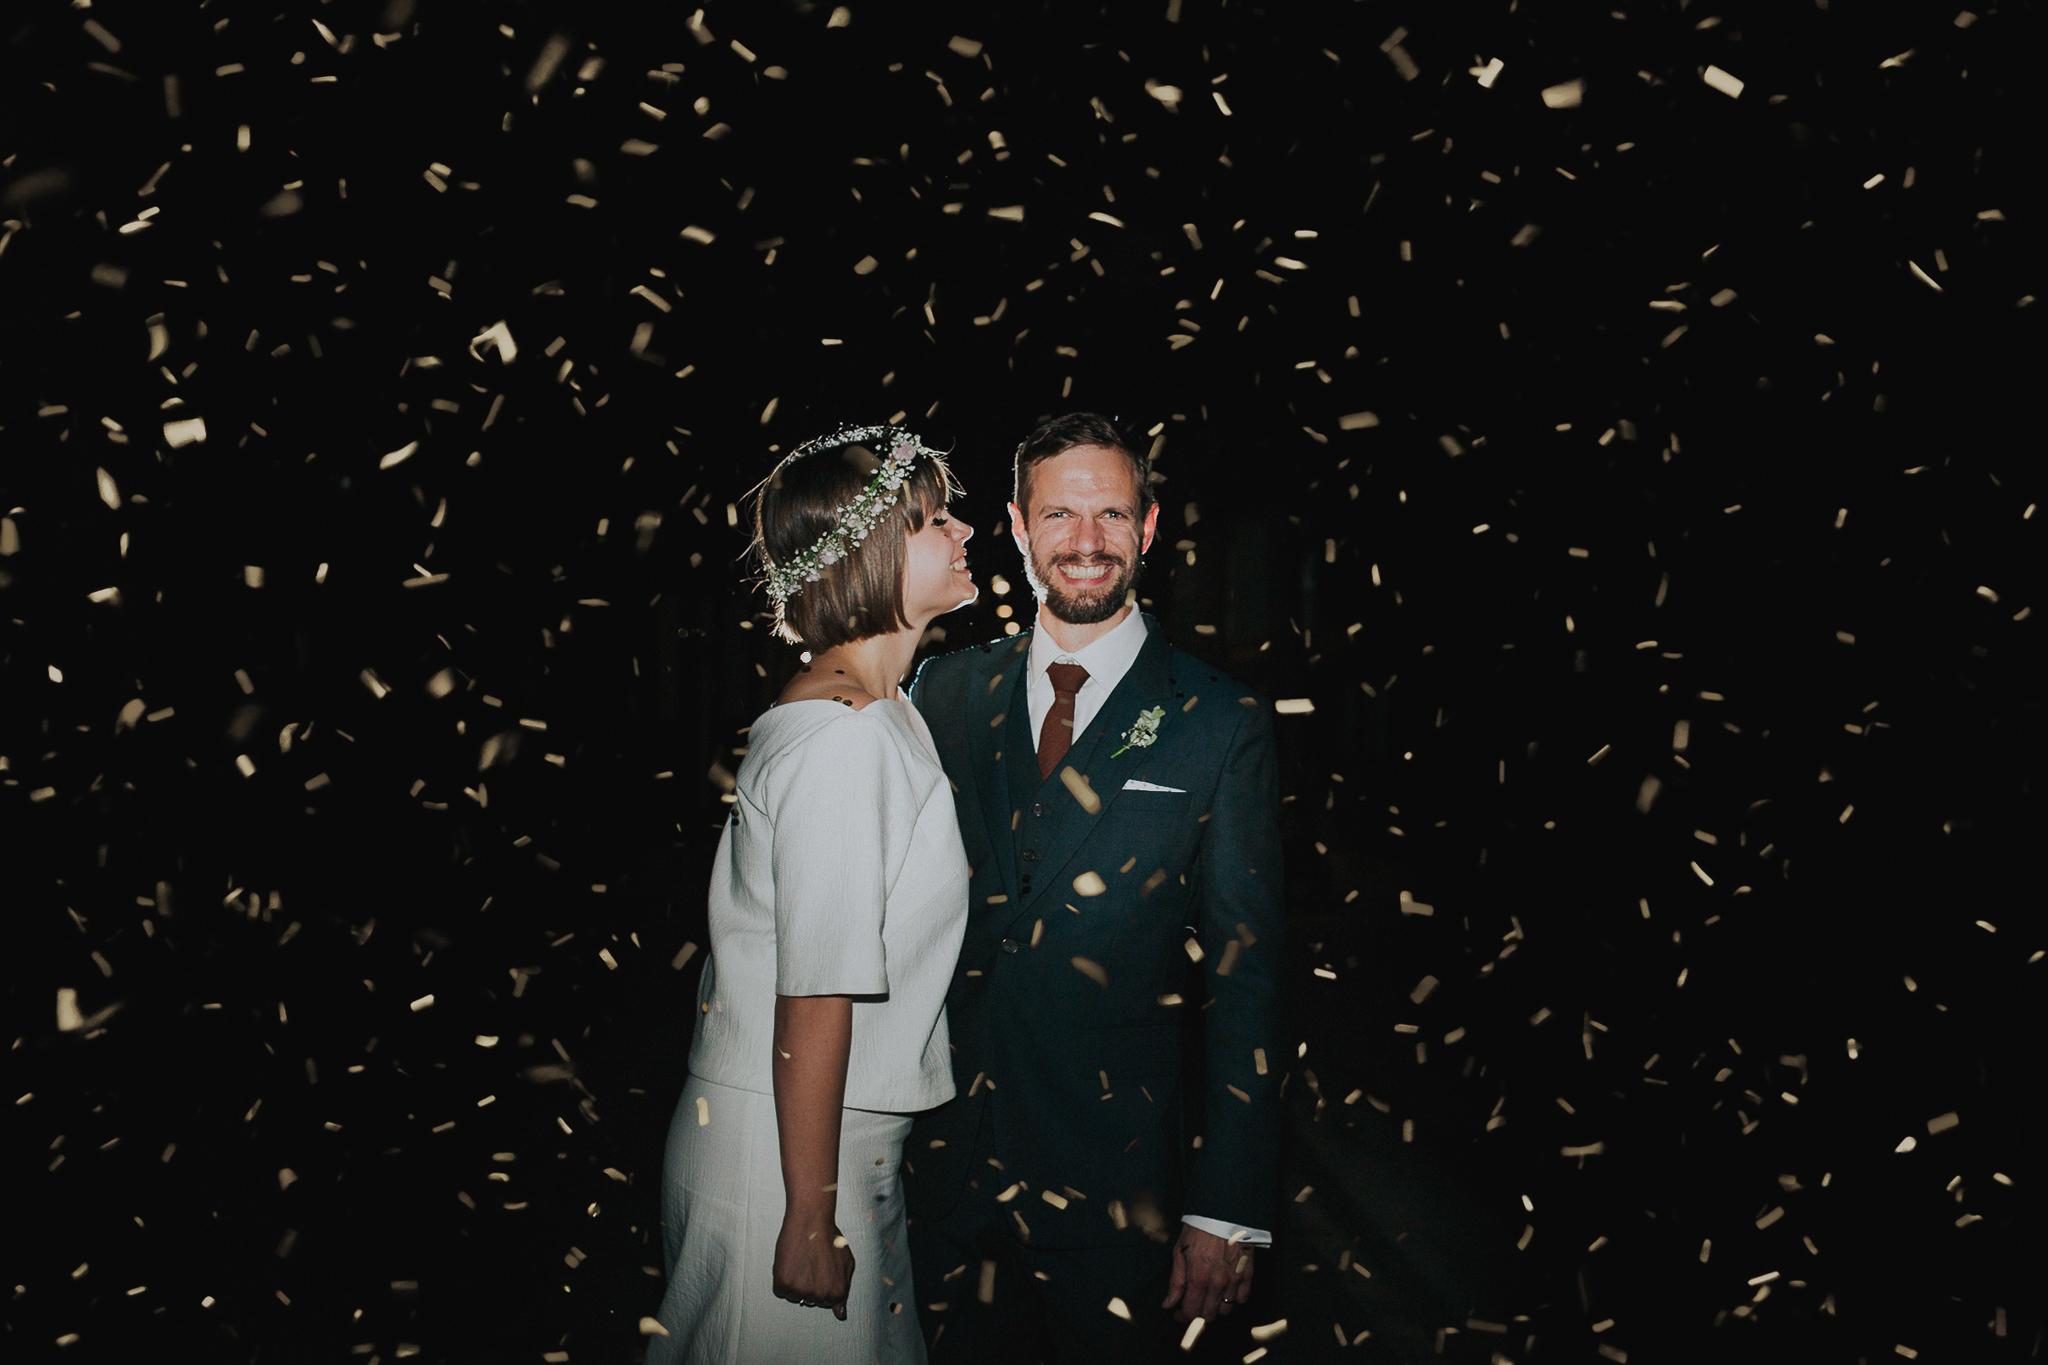 kate-gray-london-wedding-photography-87.jpg